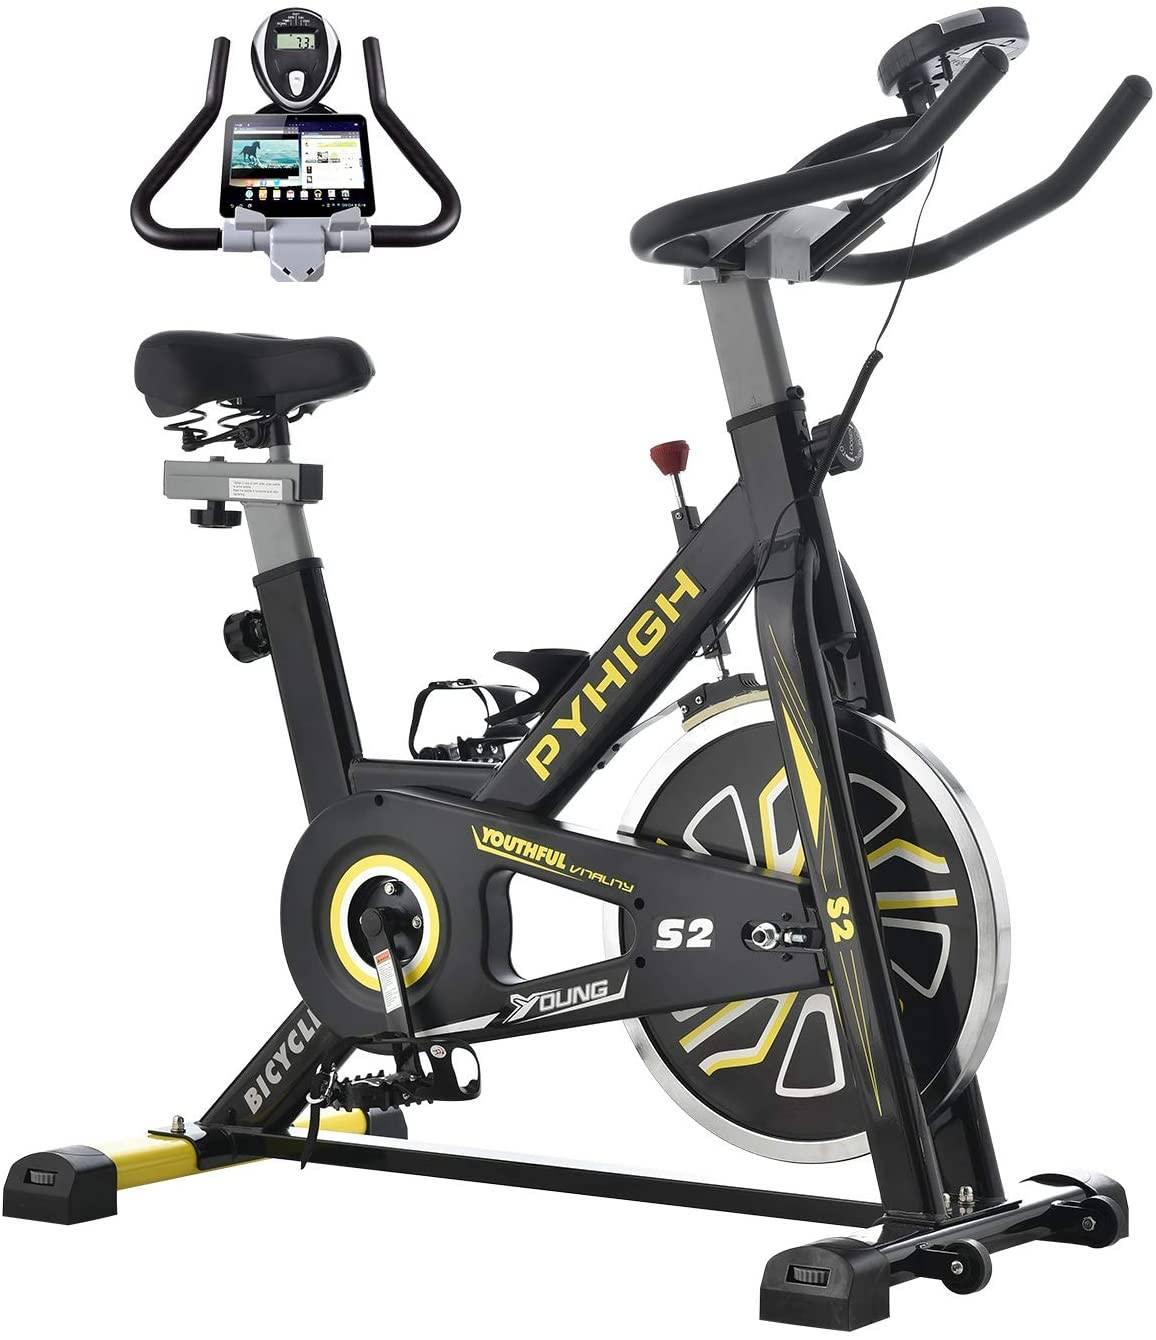 pyhigh stationary spin bike